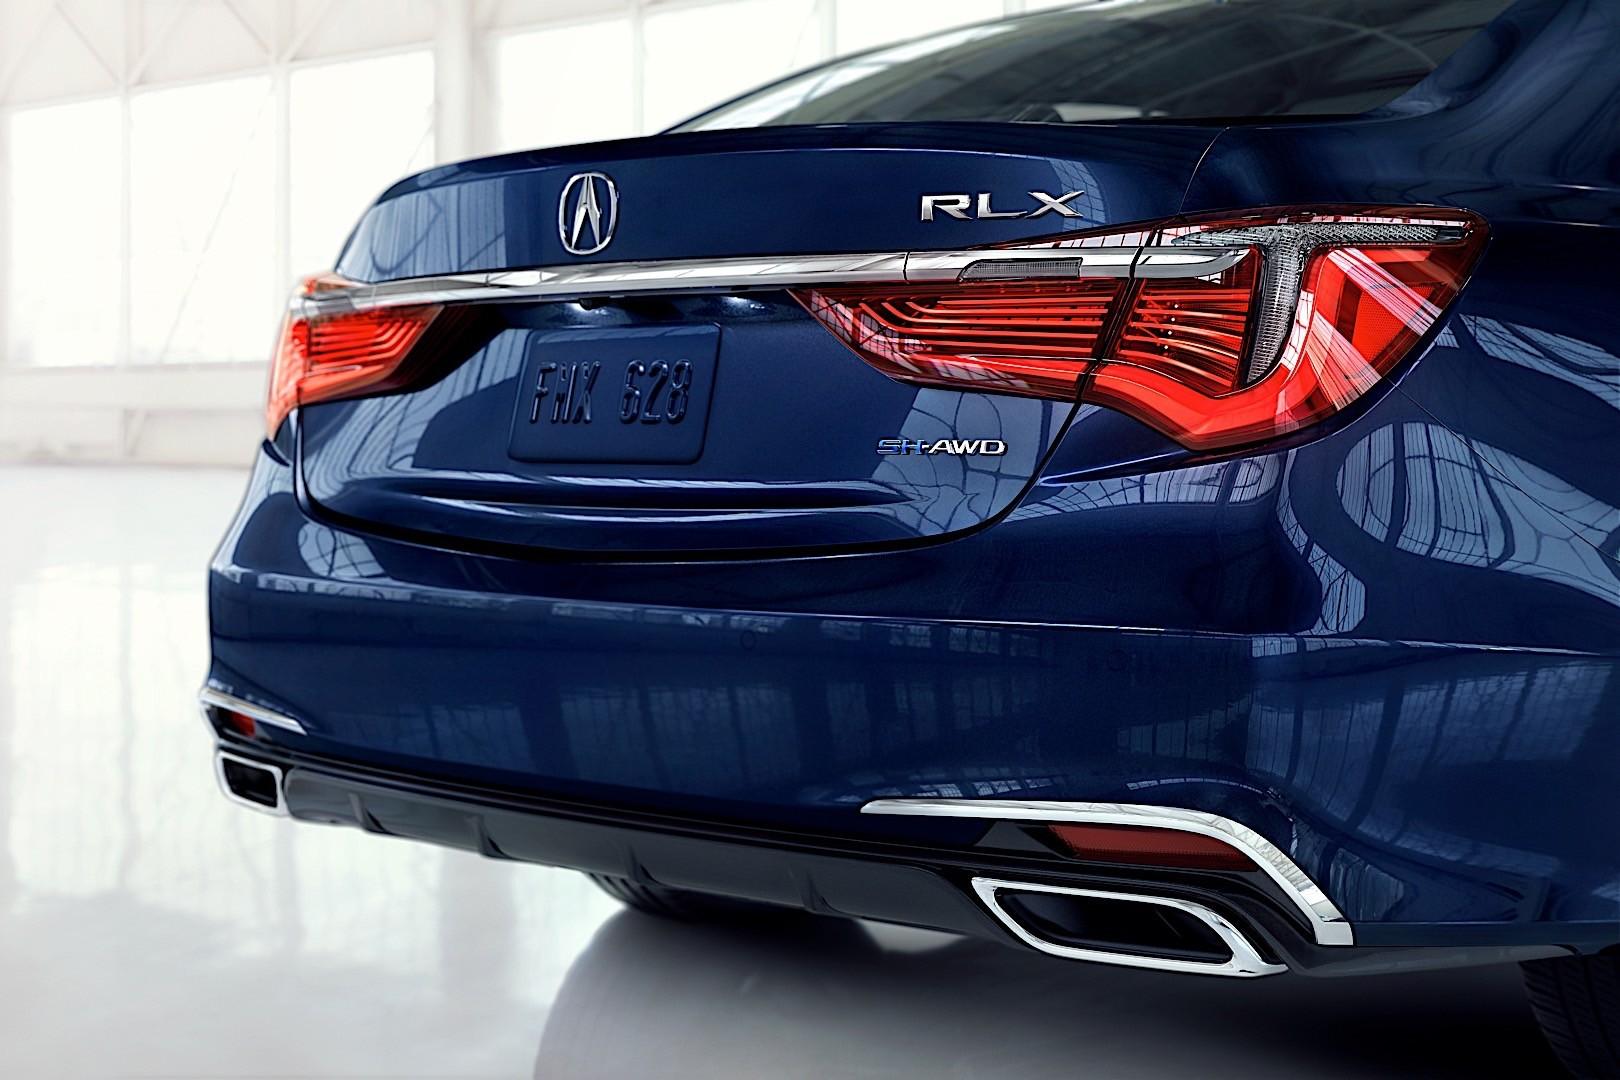 Acura Rlx 2017 Present